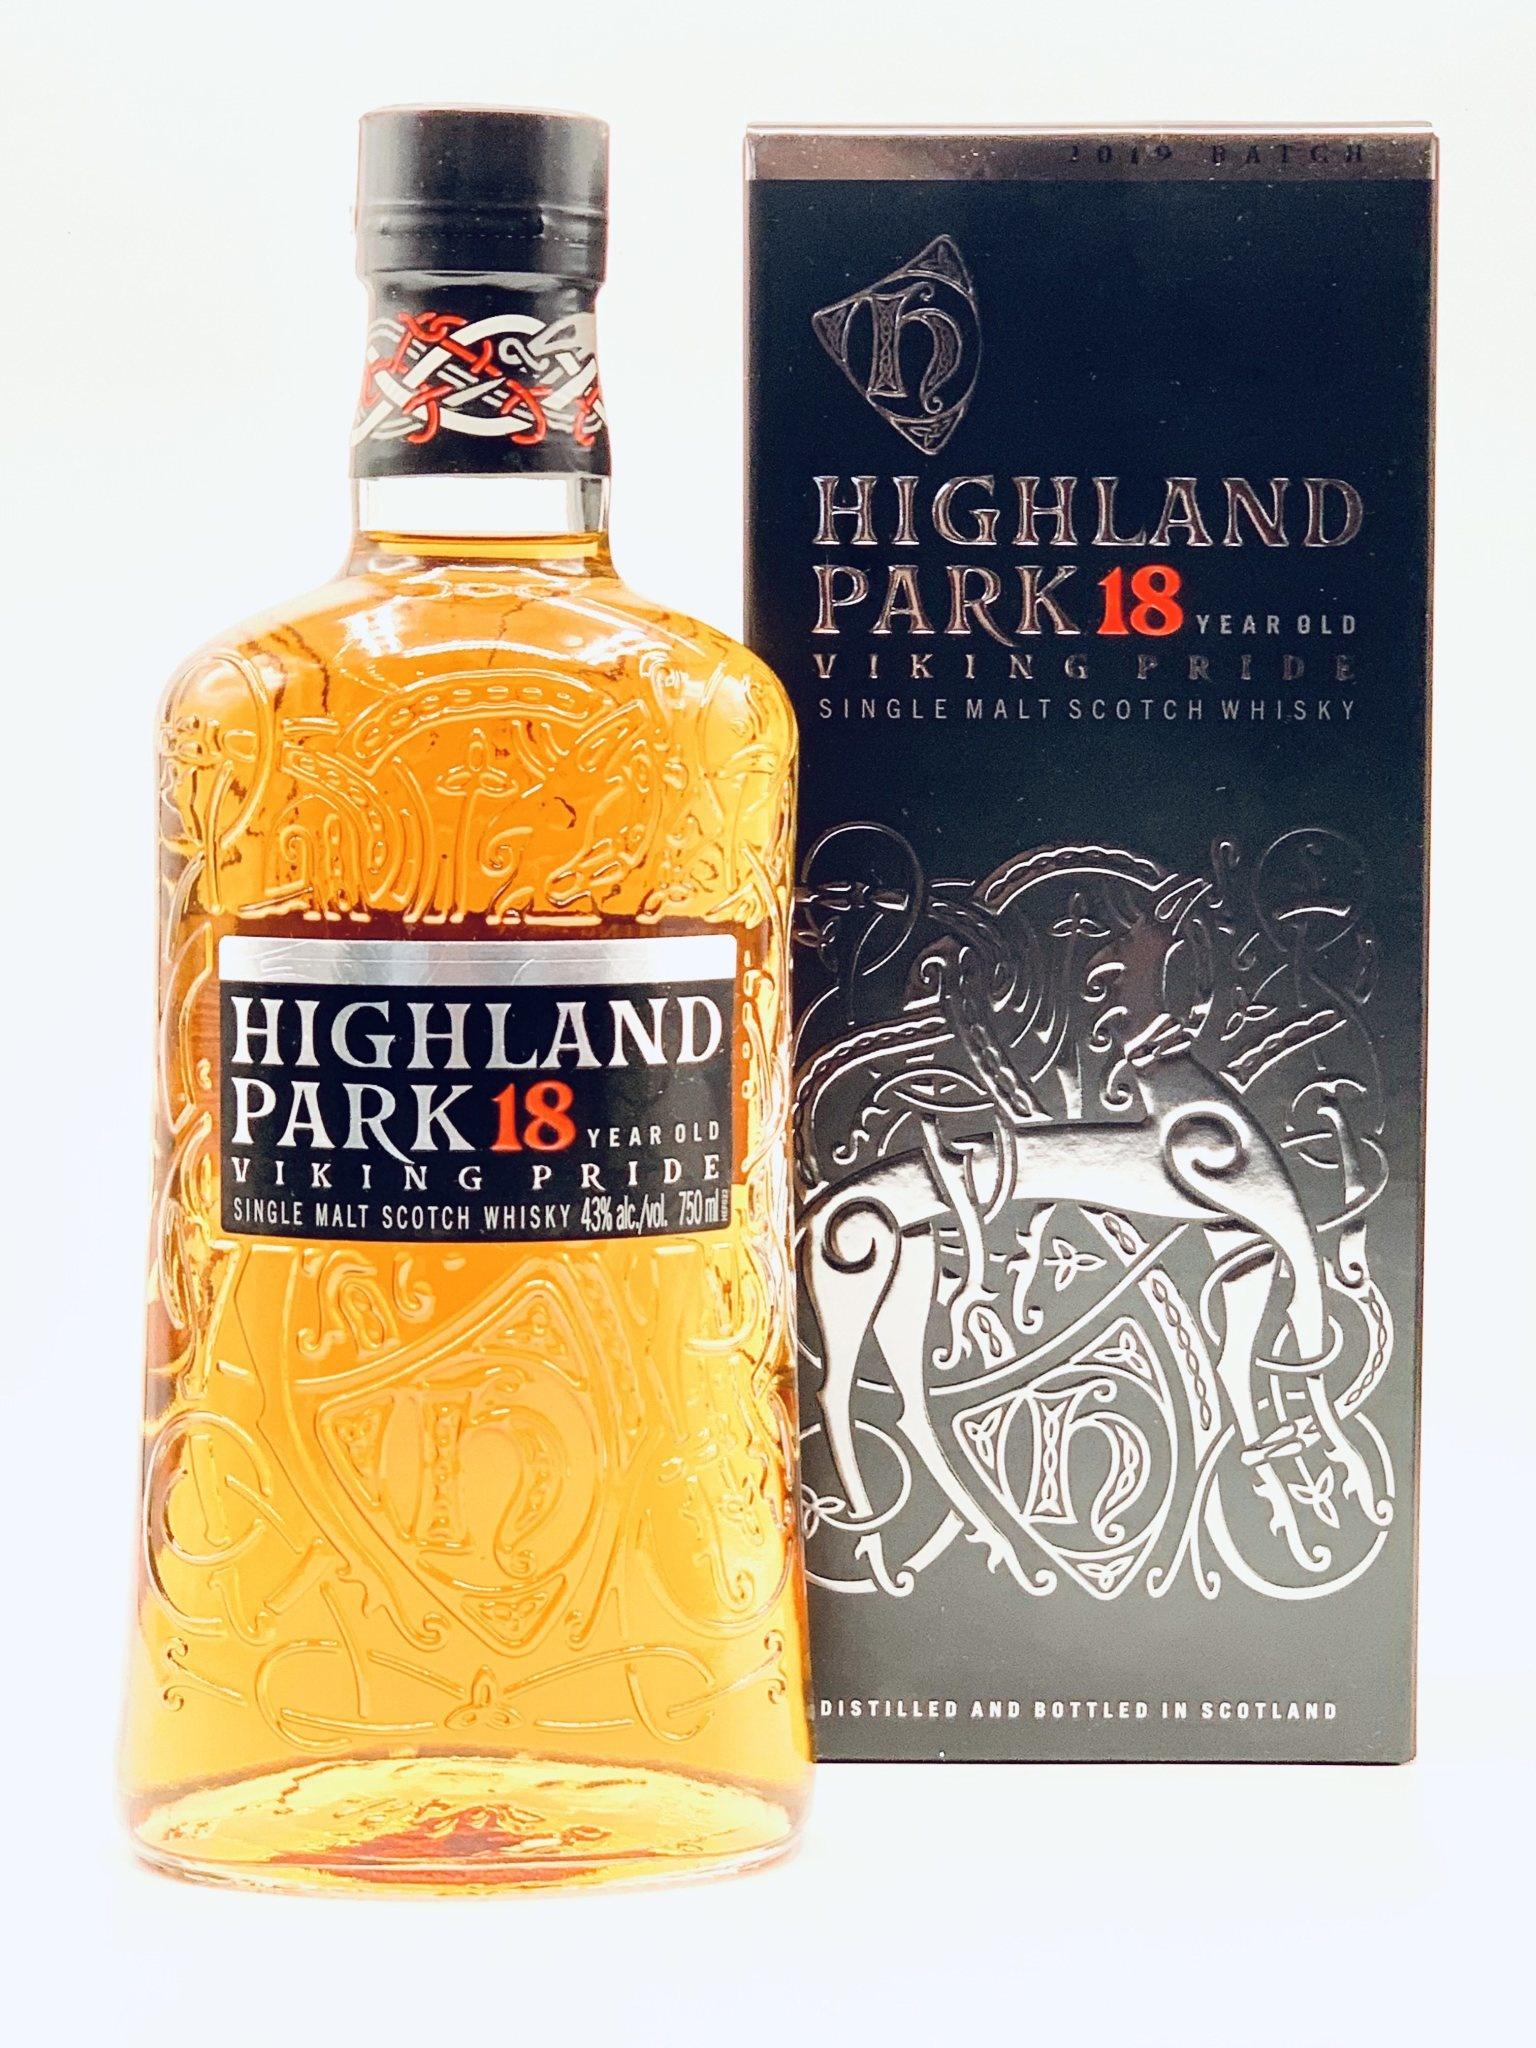 Highland Park 18yr Orkney Single Malt Scotch Whisky 750ml (86 proof)